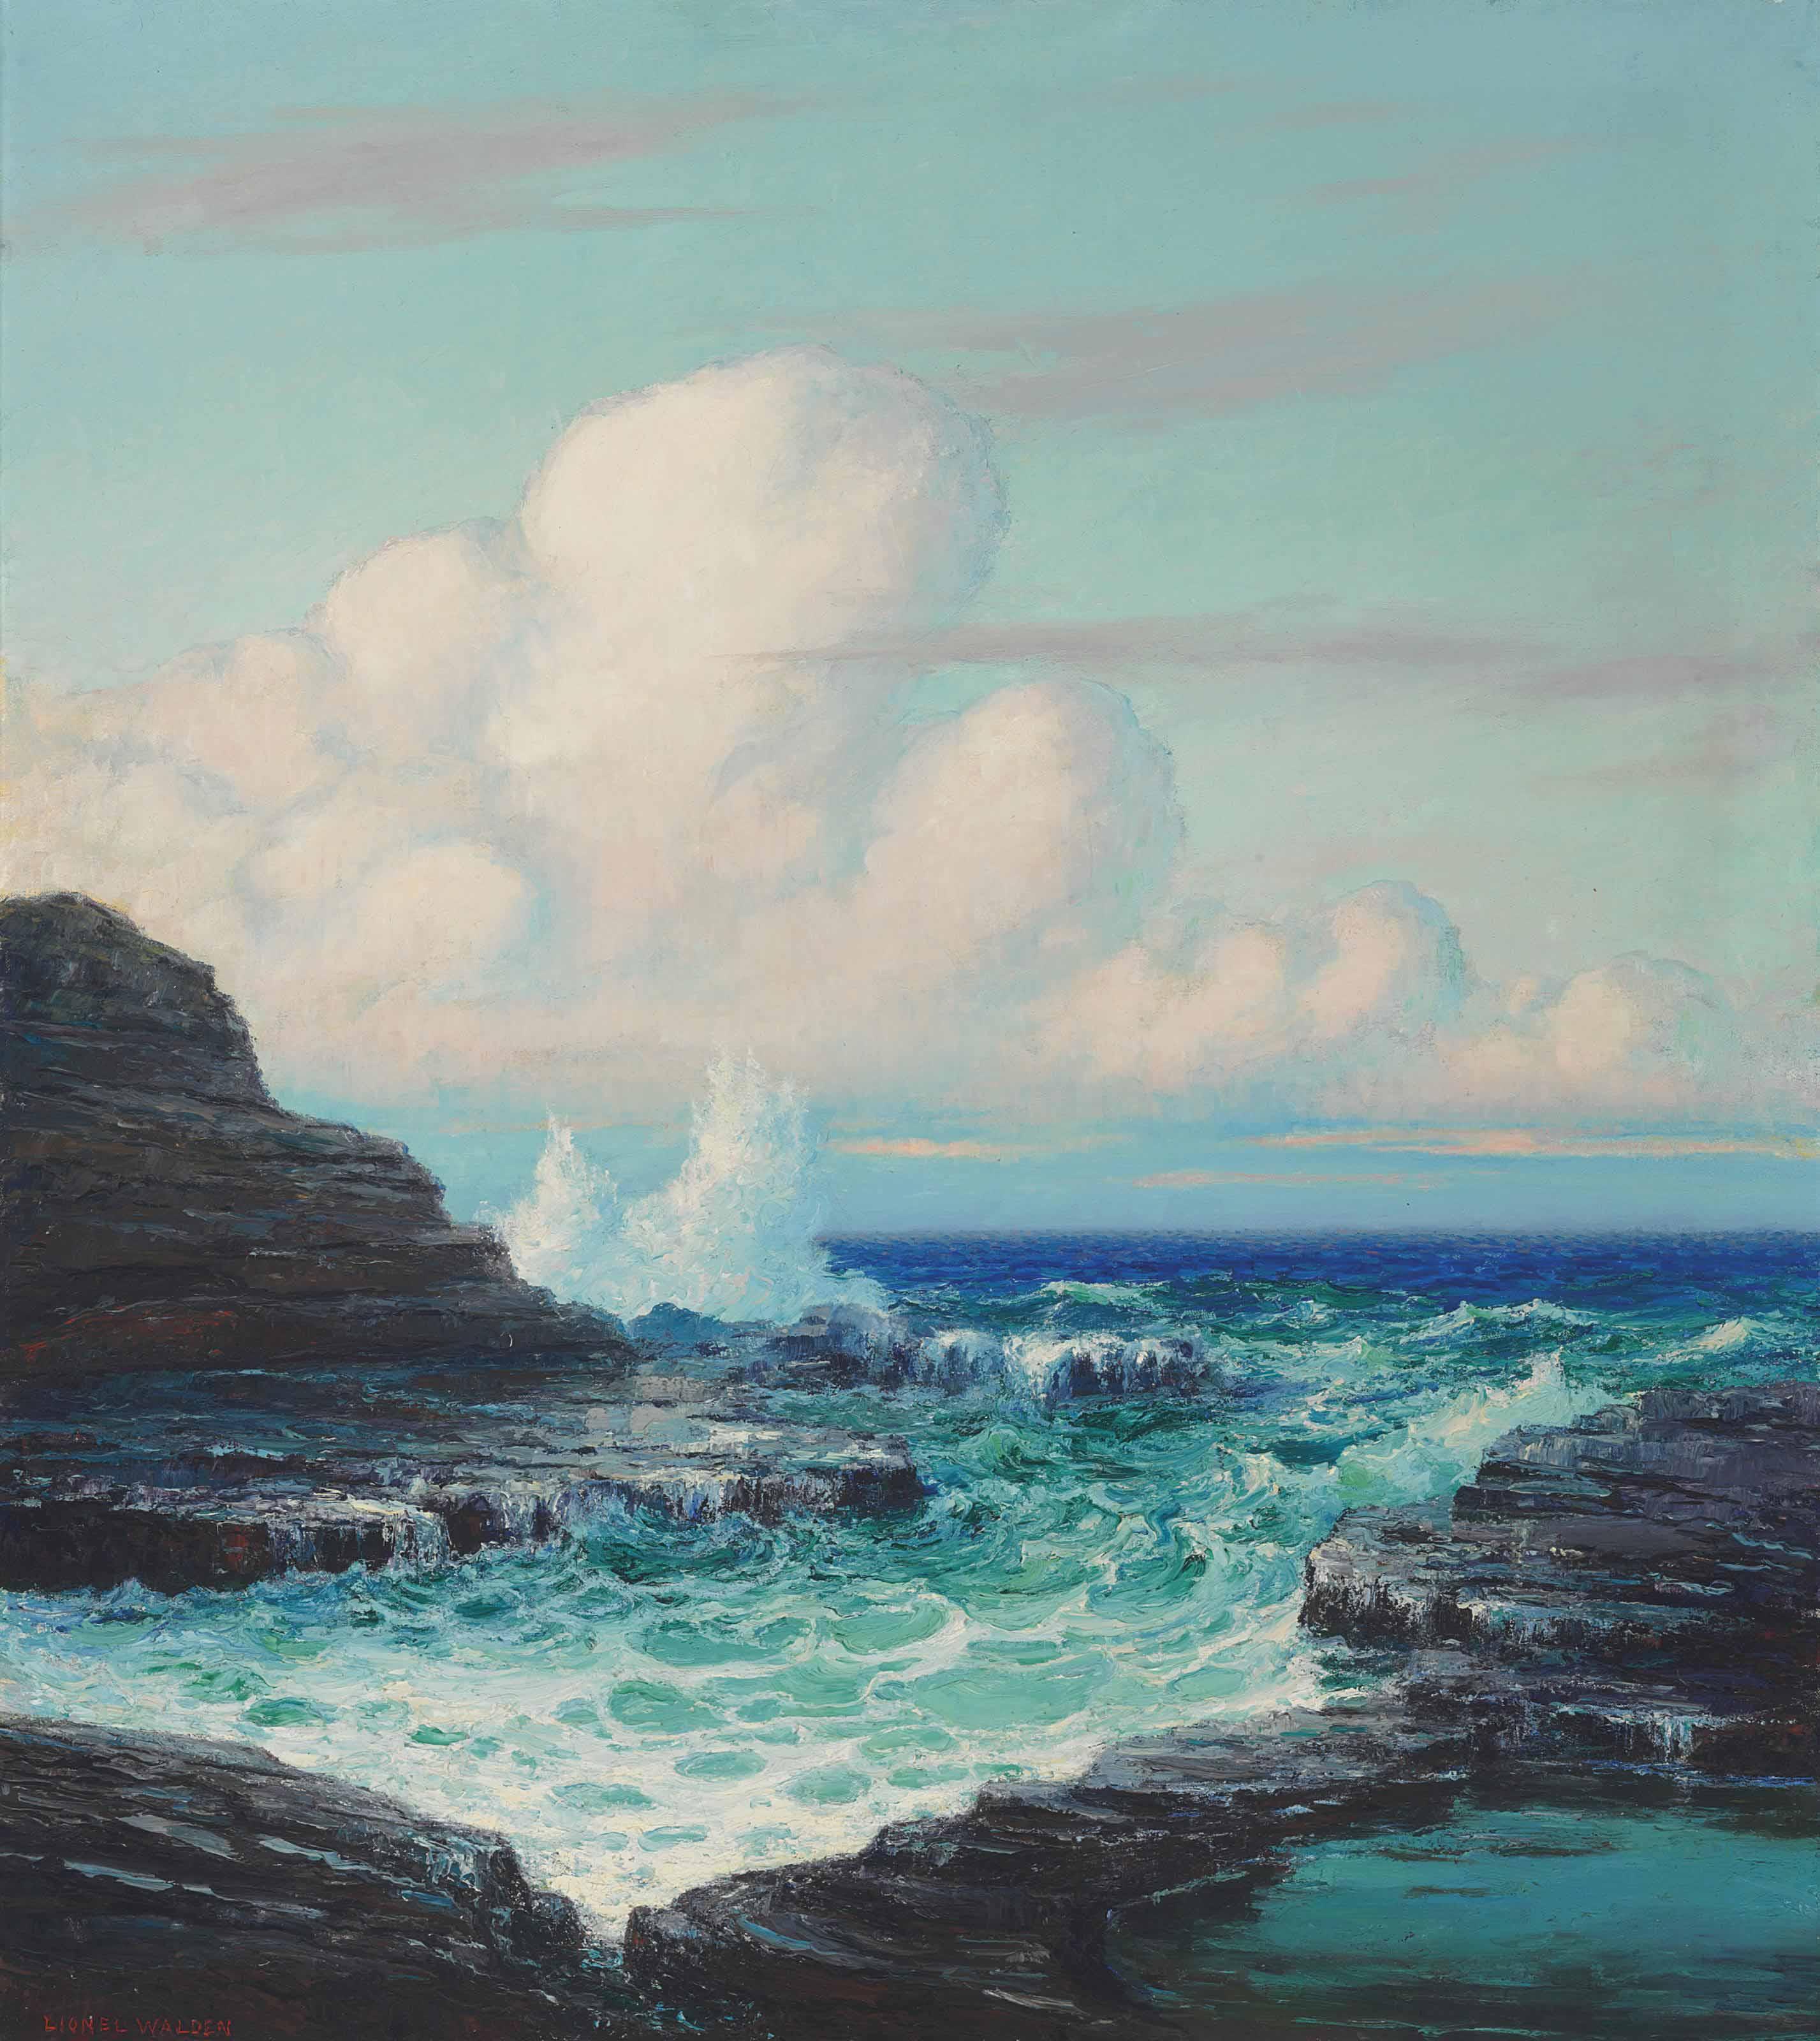 Hawaiian Ocean with Waves Against the Rocks